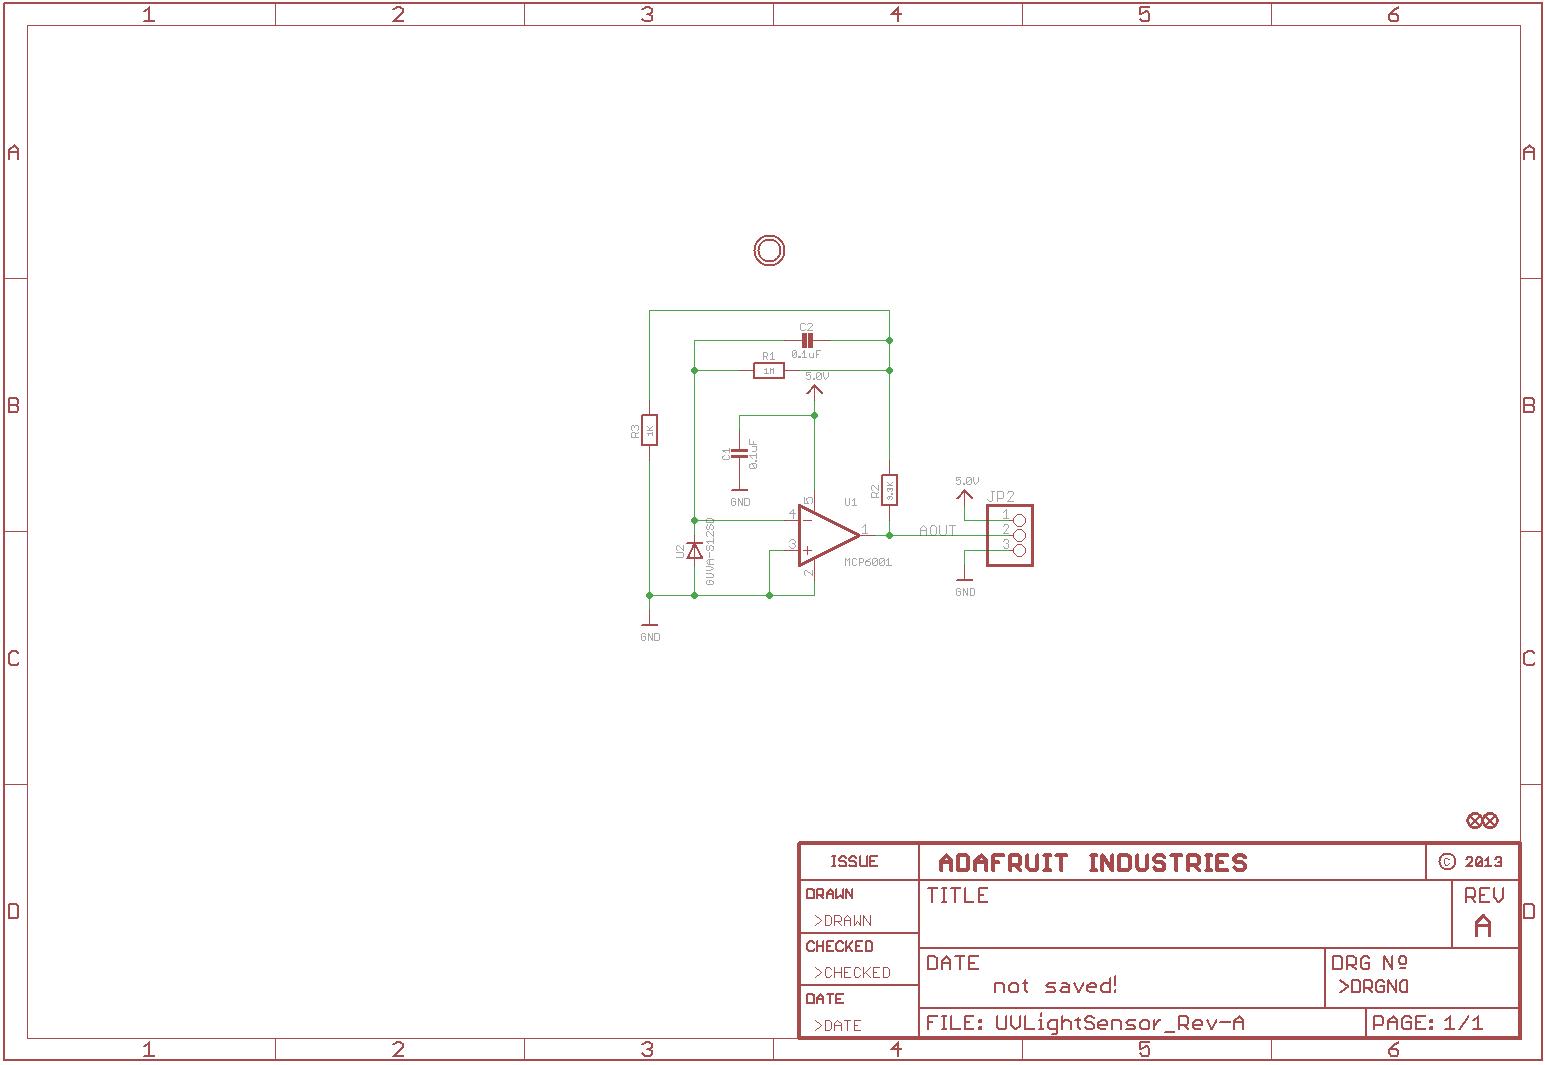 components_guvaschem.png